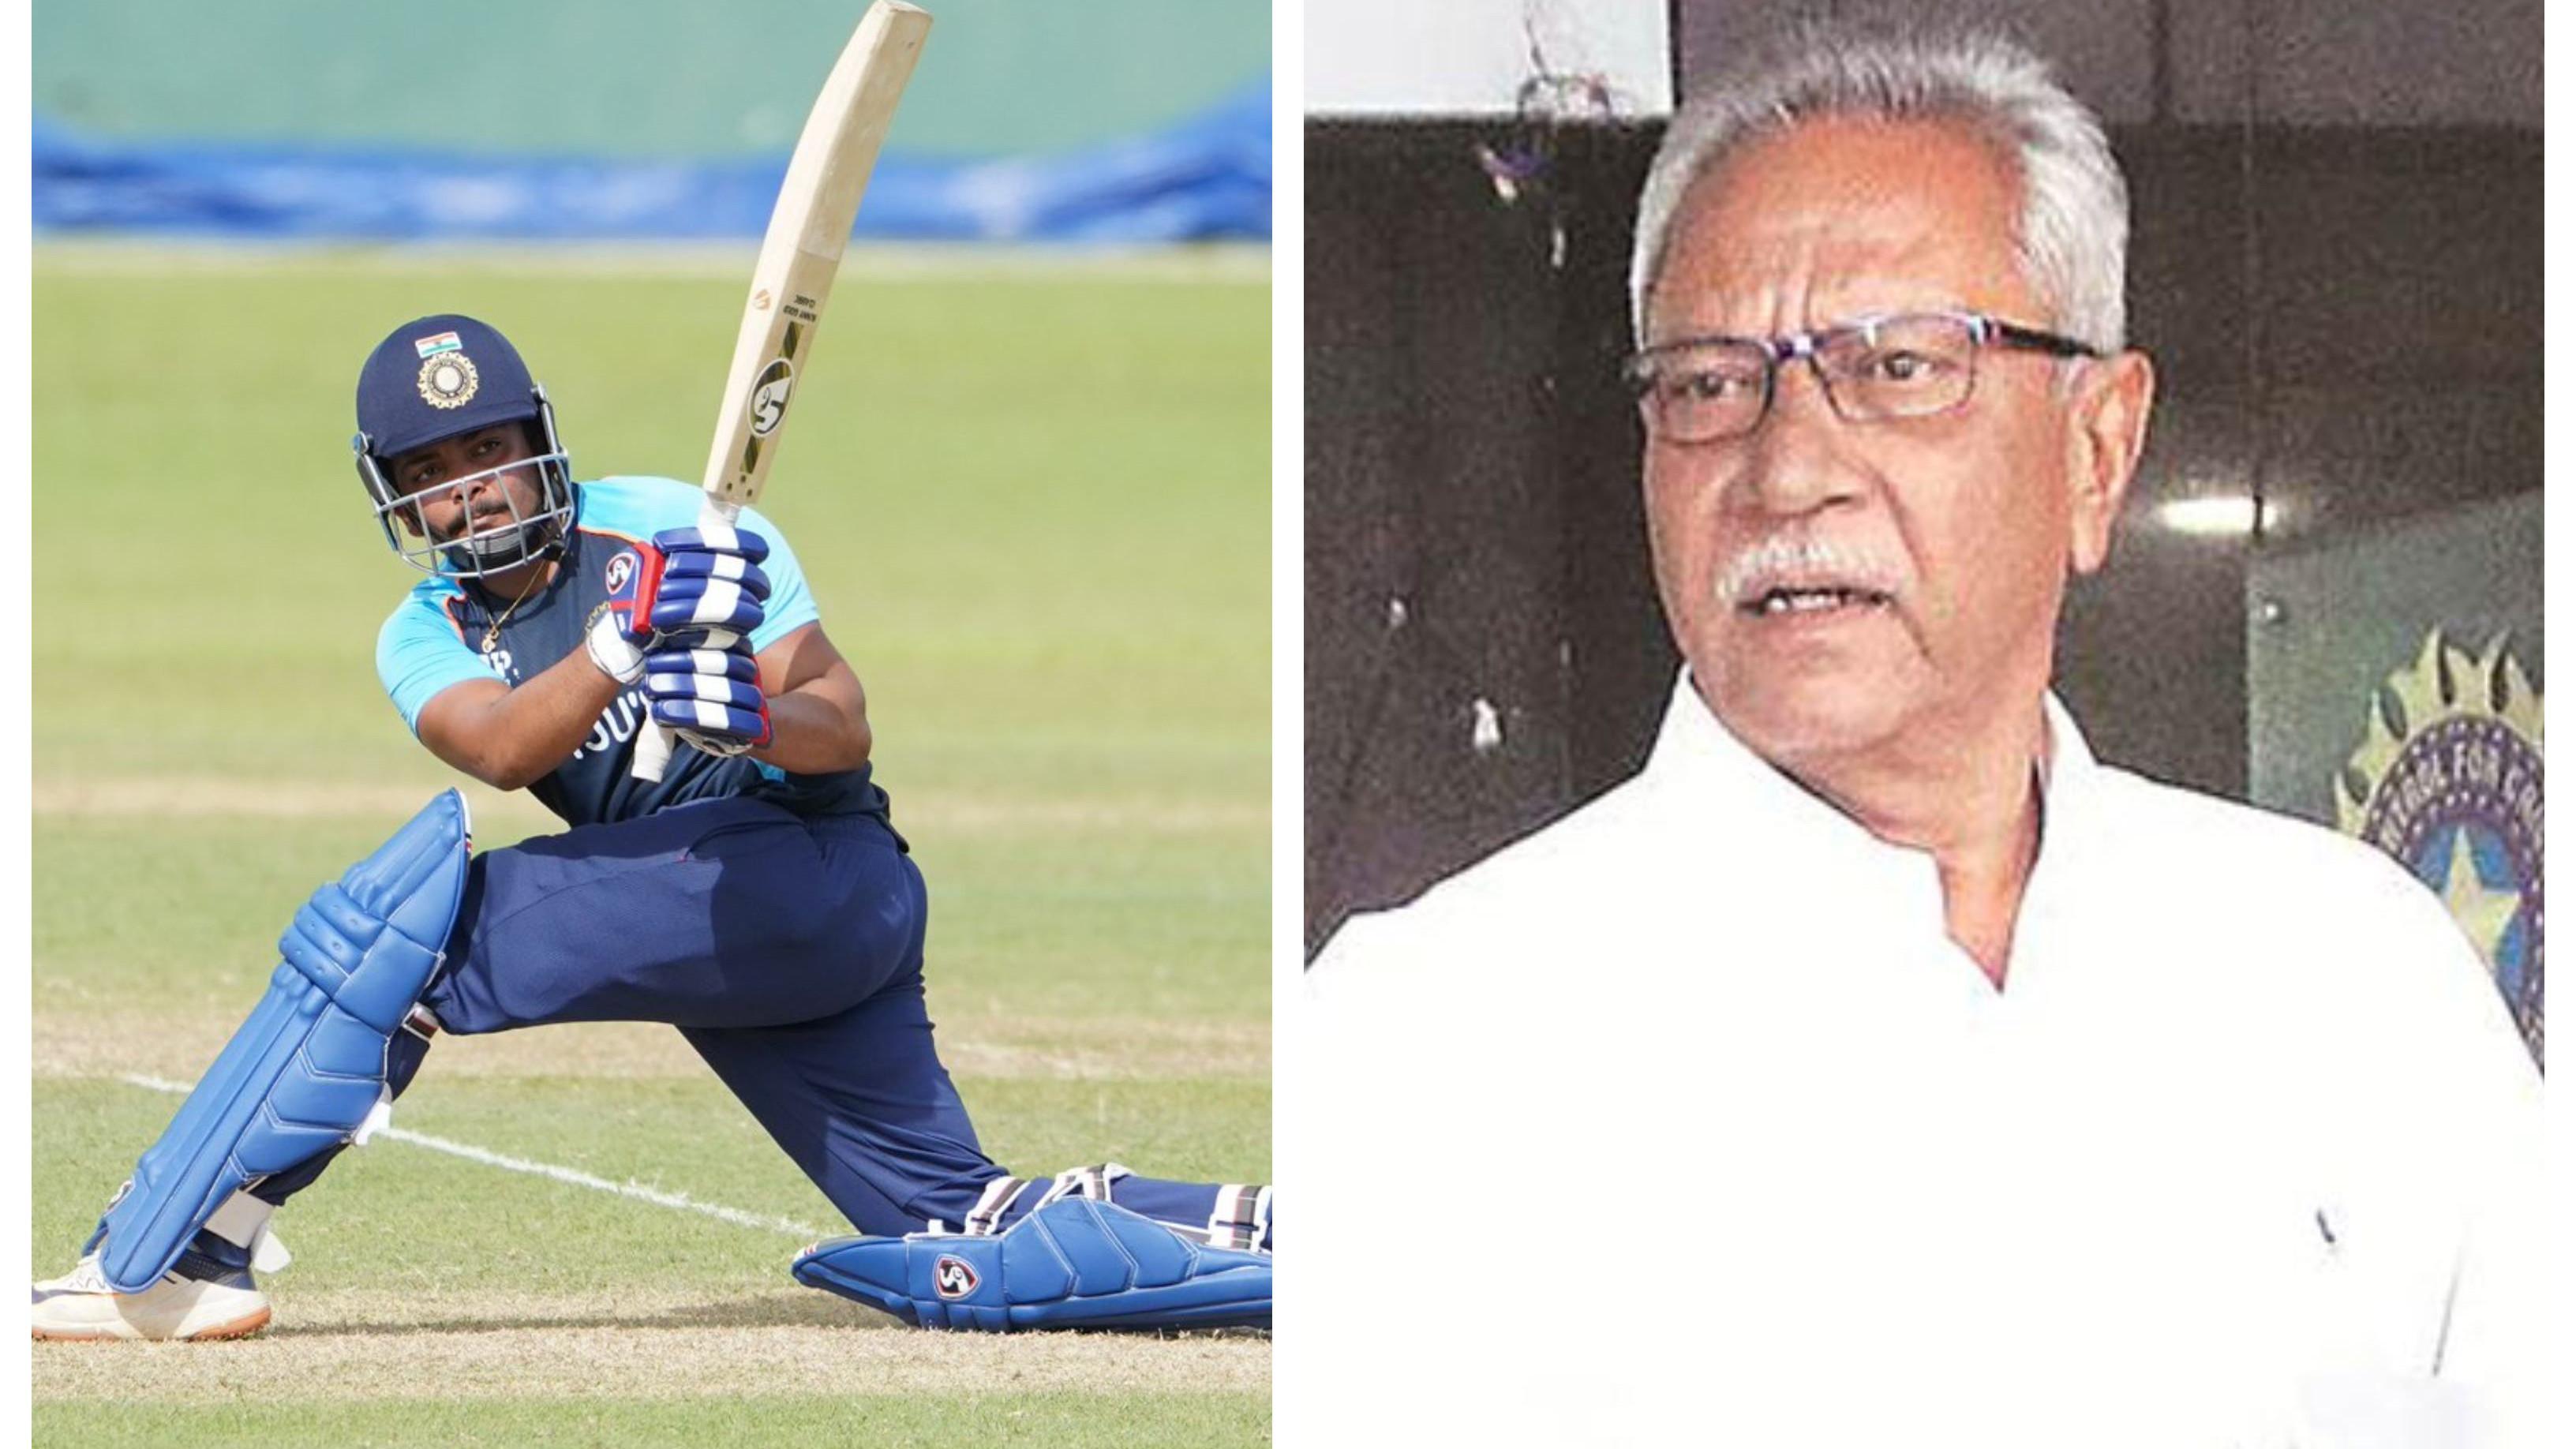 SL v IND 2021: Anshuman Gaekwad advises Prithvi Shaw to stay grounded in Sri Lanka